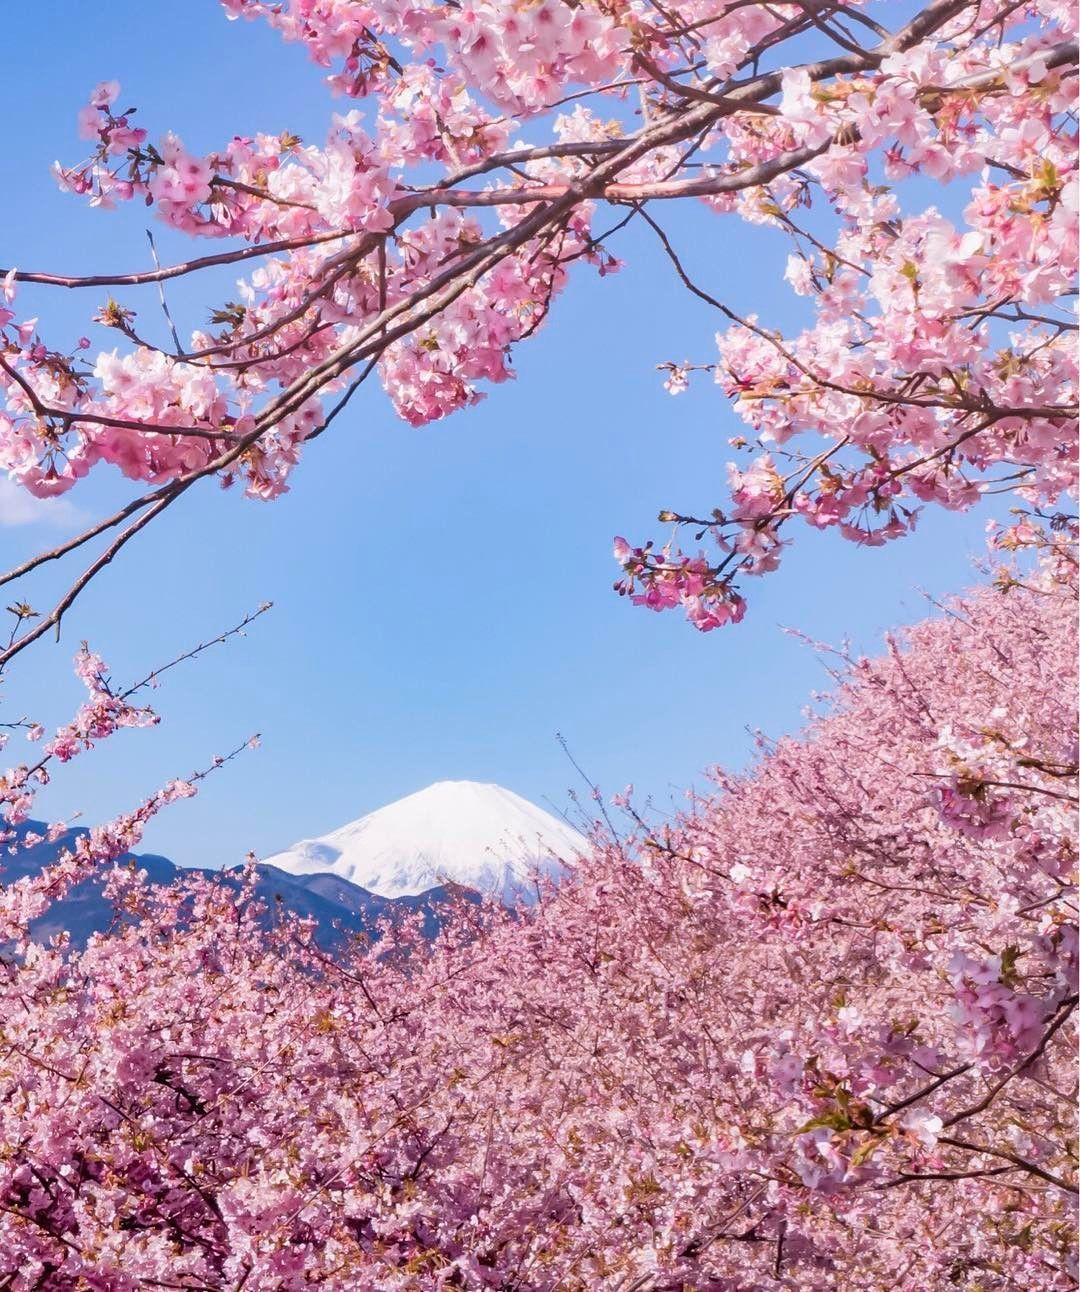 Cherry Blossom Season In Kawazu Japan Has Arrived Take A Look Architectural Digest Origin And Cherry Blossom Japan Blossom Trees Cherry Blossom Season